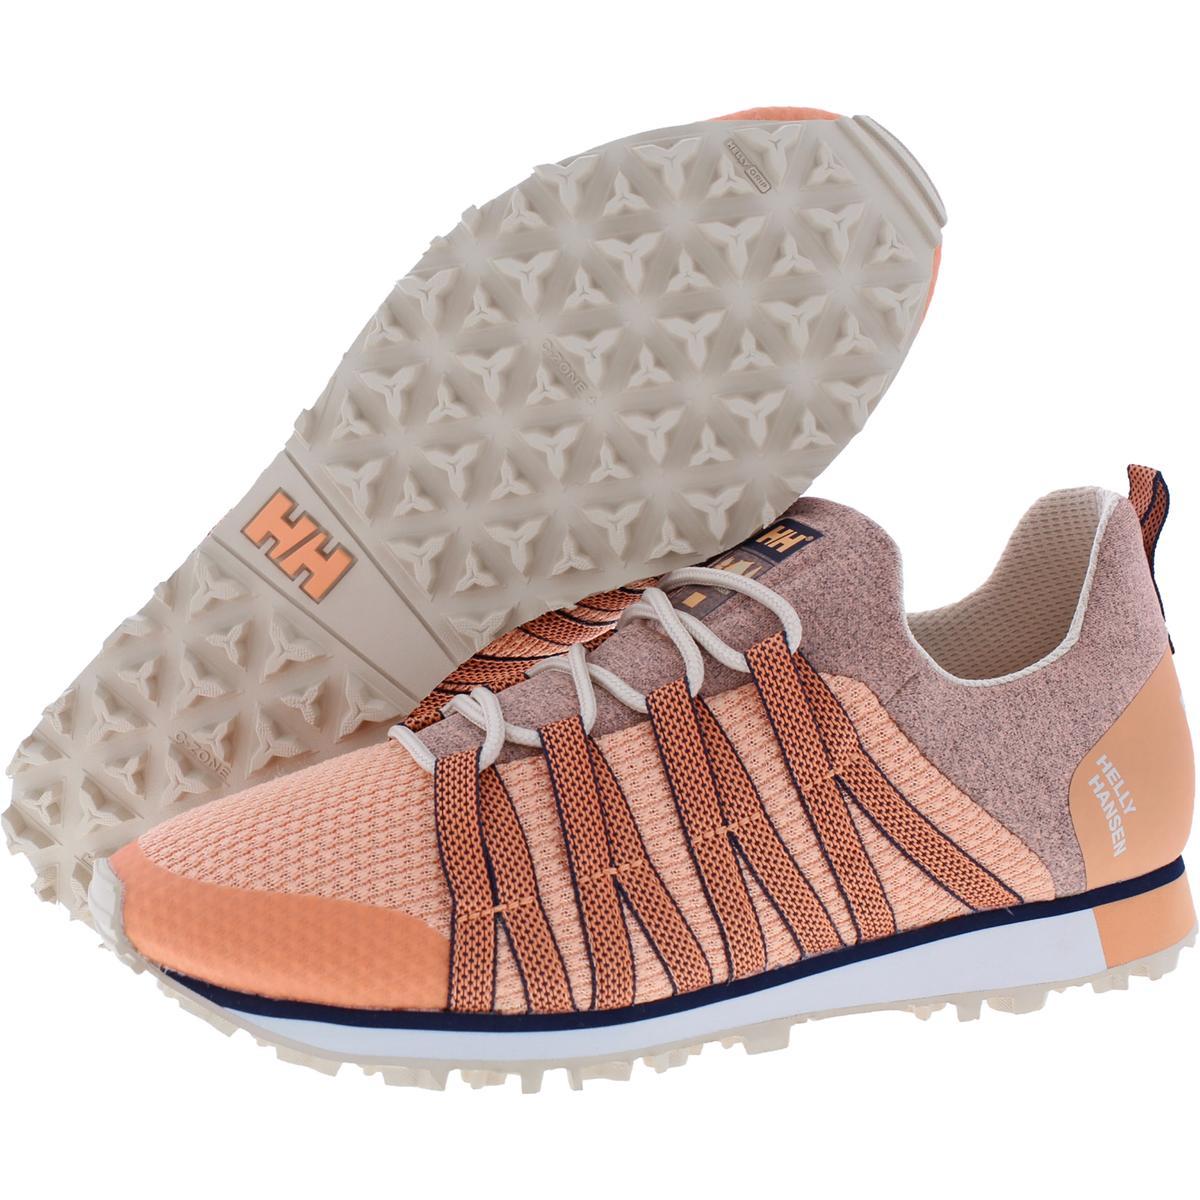 thumbnail 11 - Helly-Hansen-Womens-Vardapeak-V2-Fitness-Performance-Sneakers-Shoes-BHFO-9846